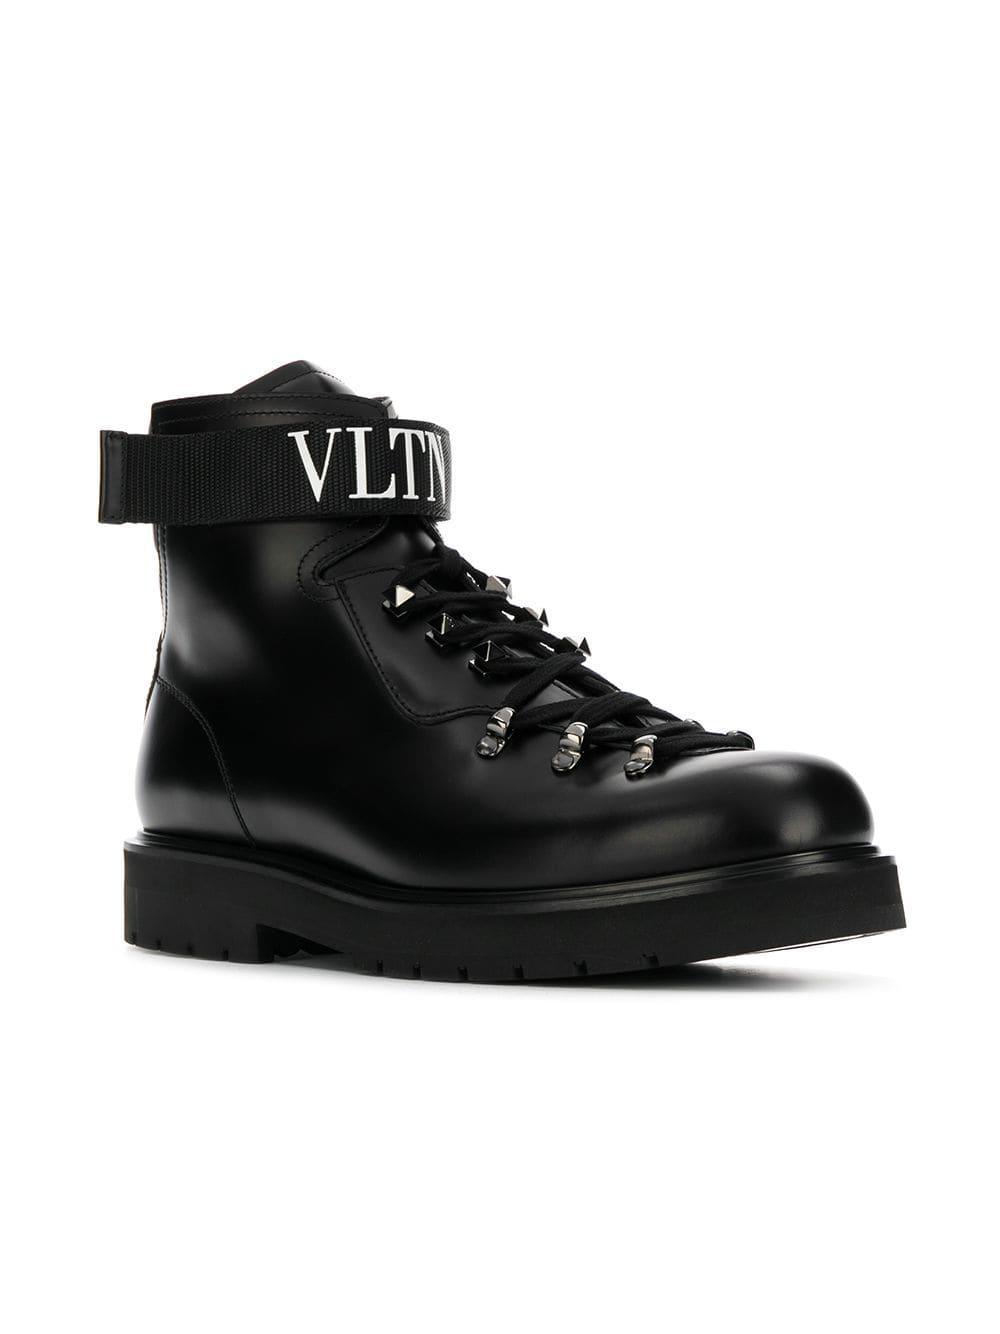 Valentino Leather Valentino Garavani